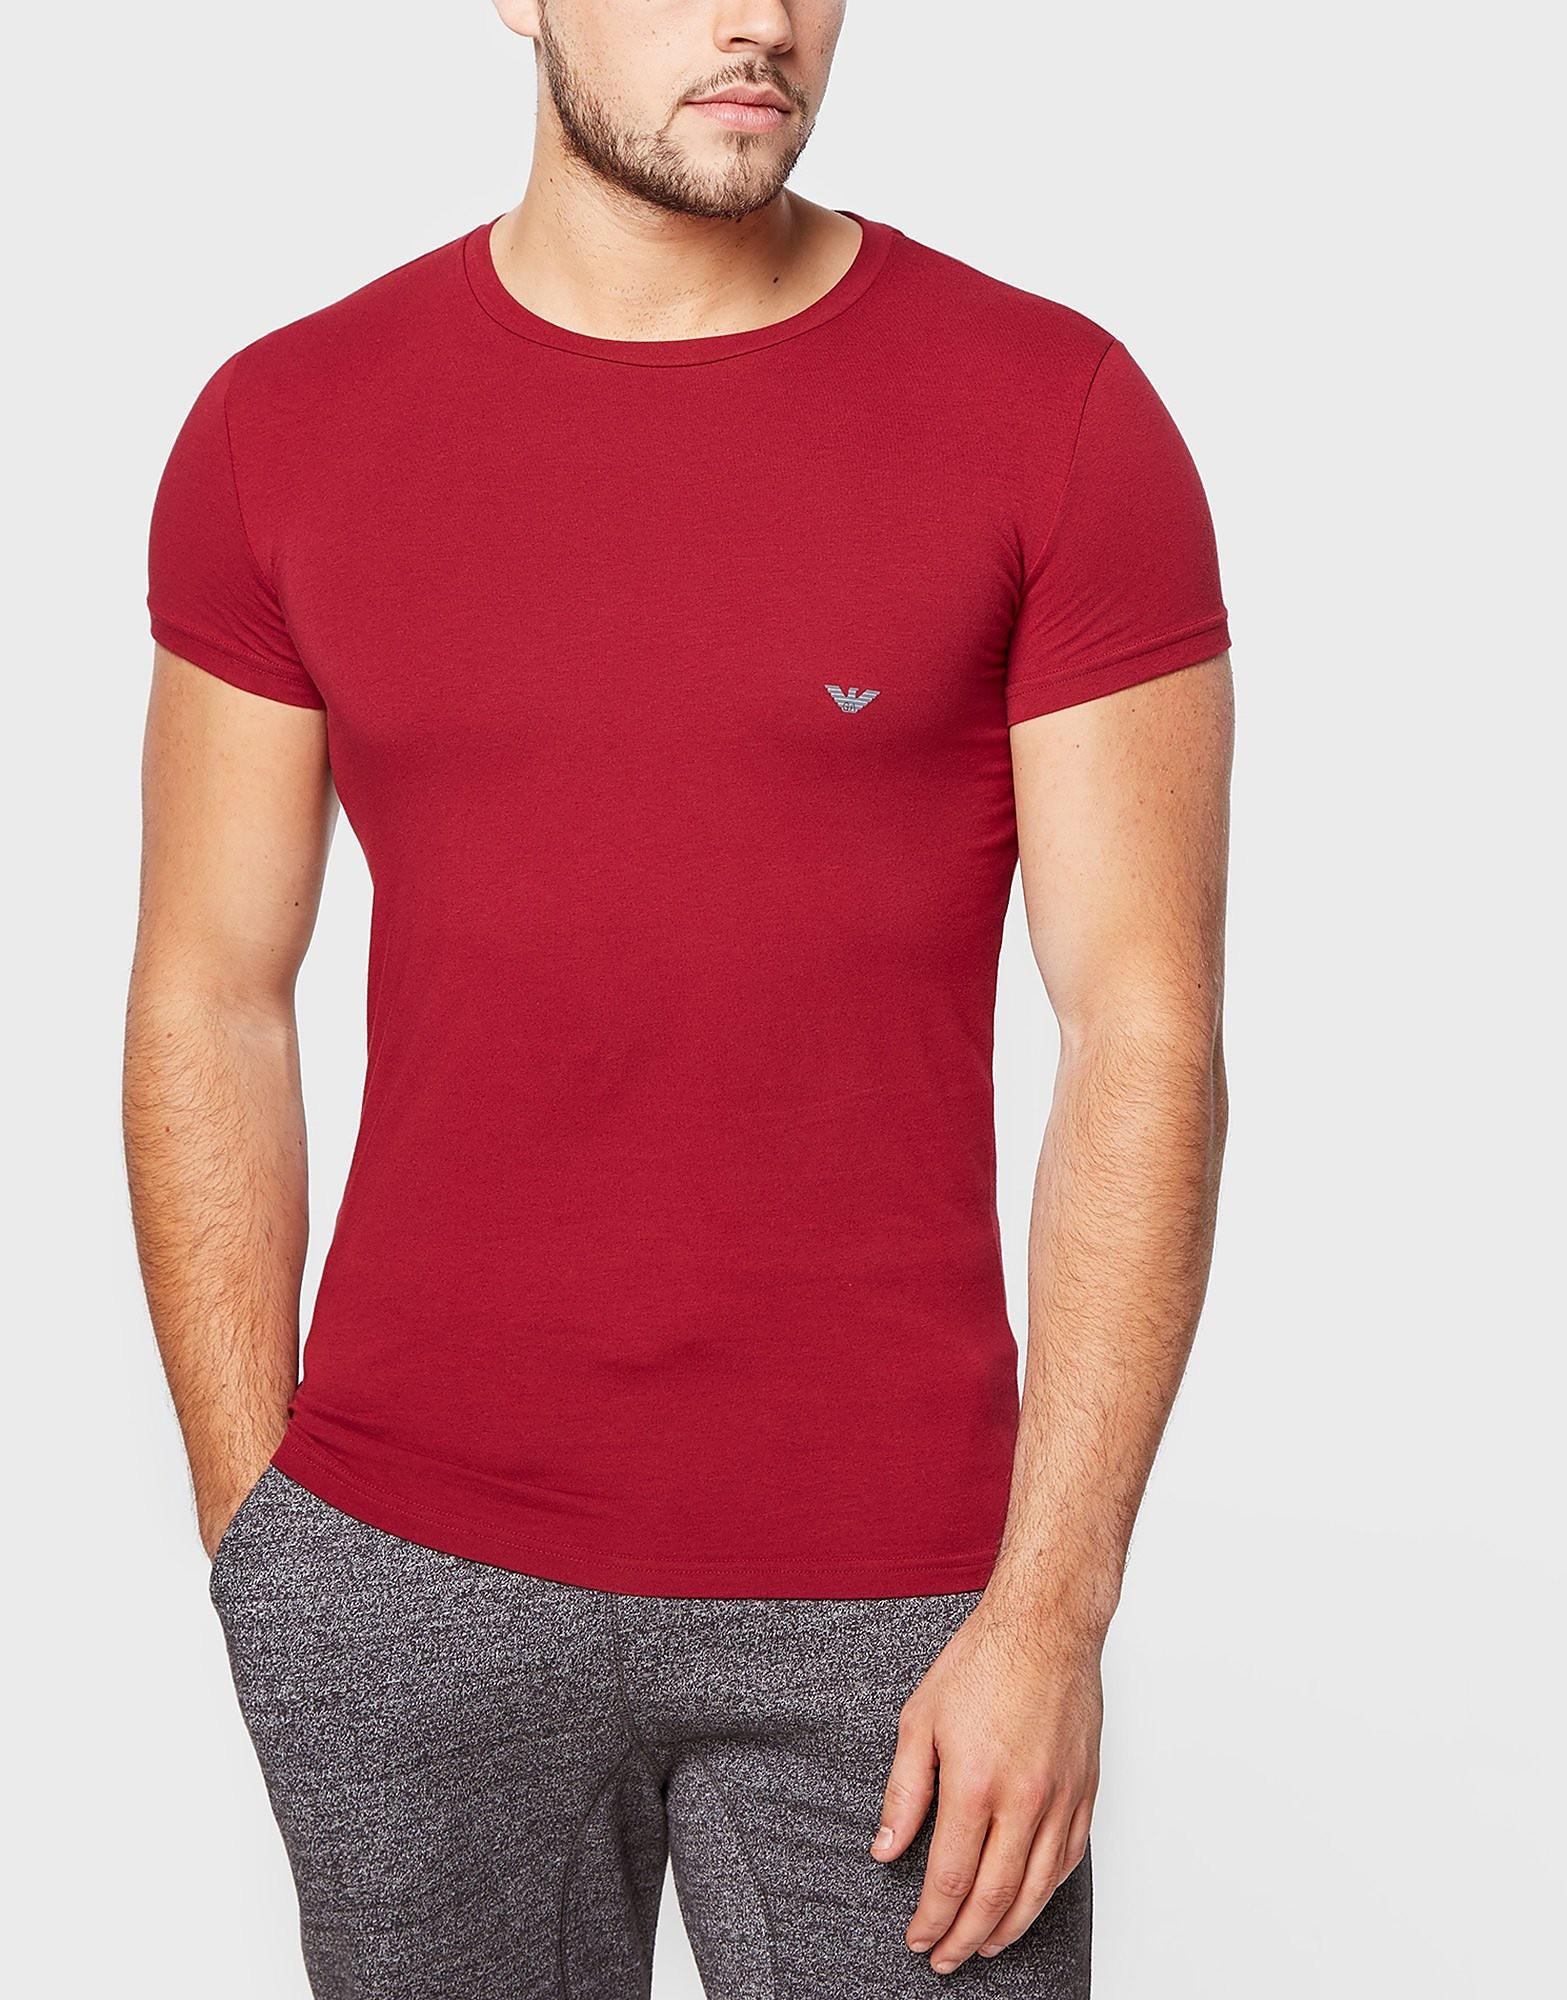 Emporio Armani Eagle Crew T-Shirt